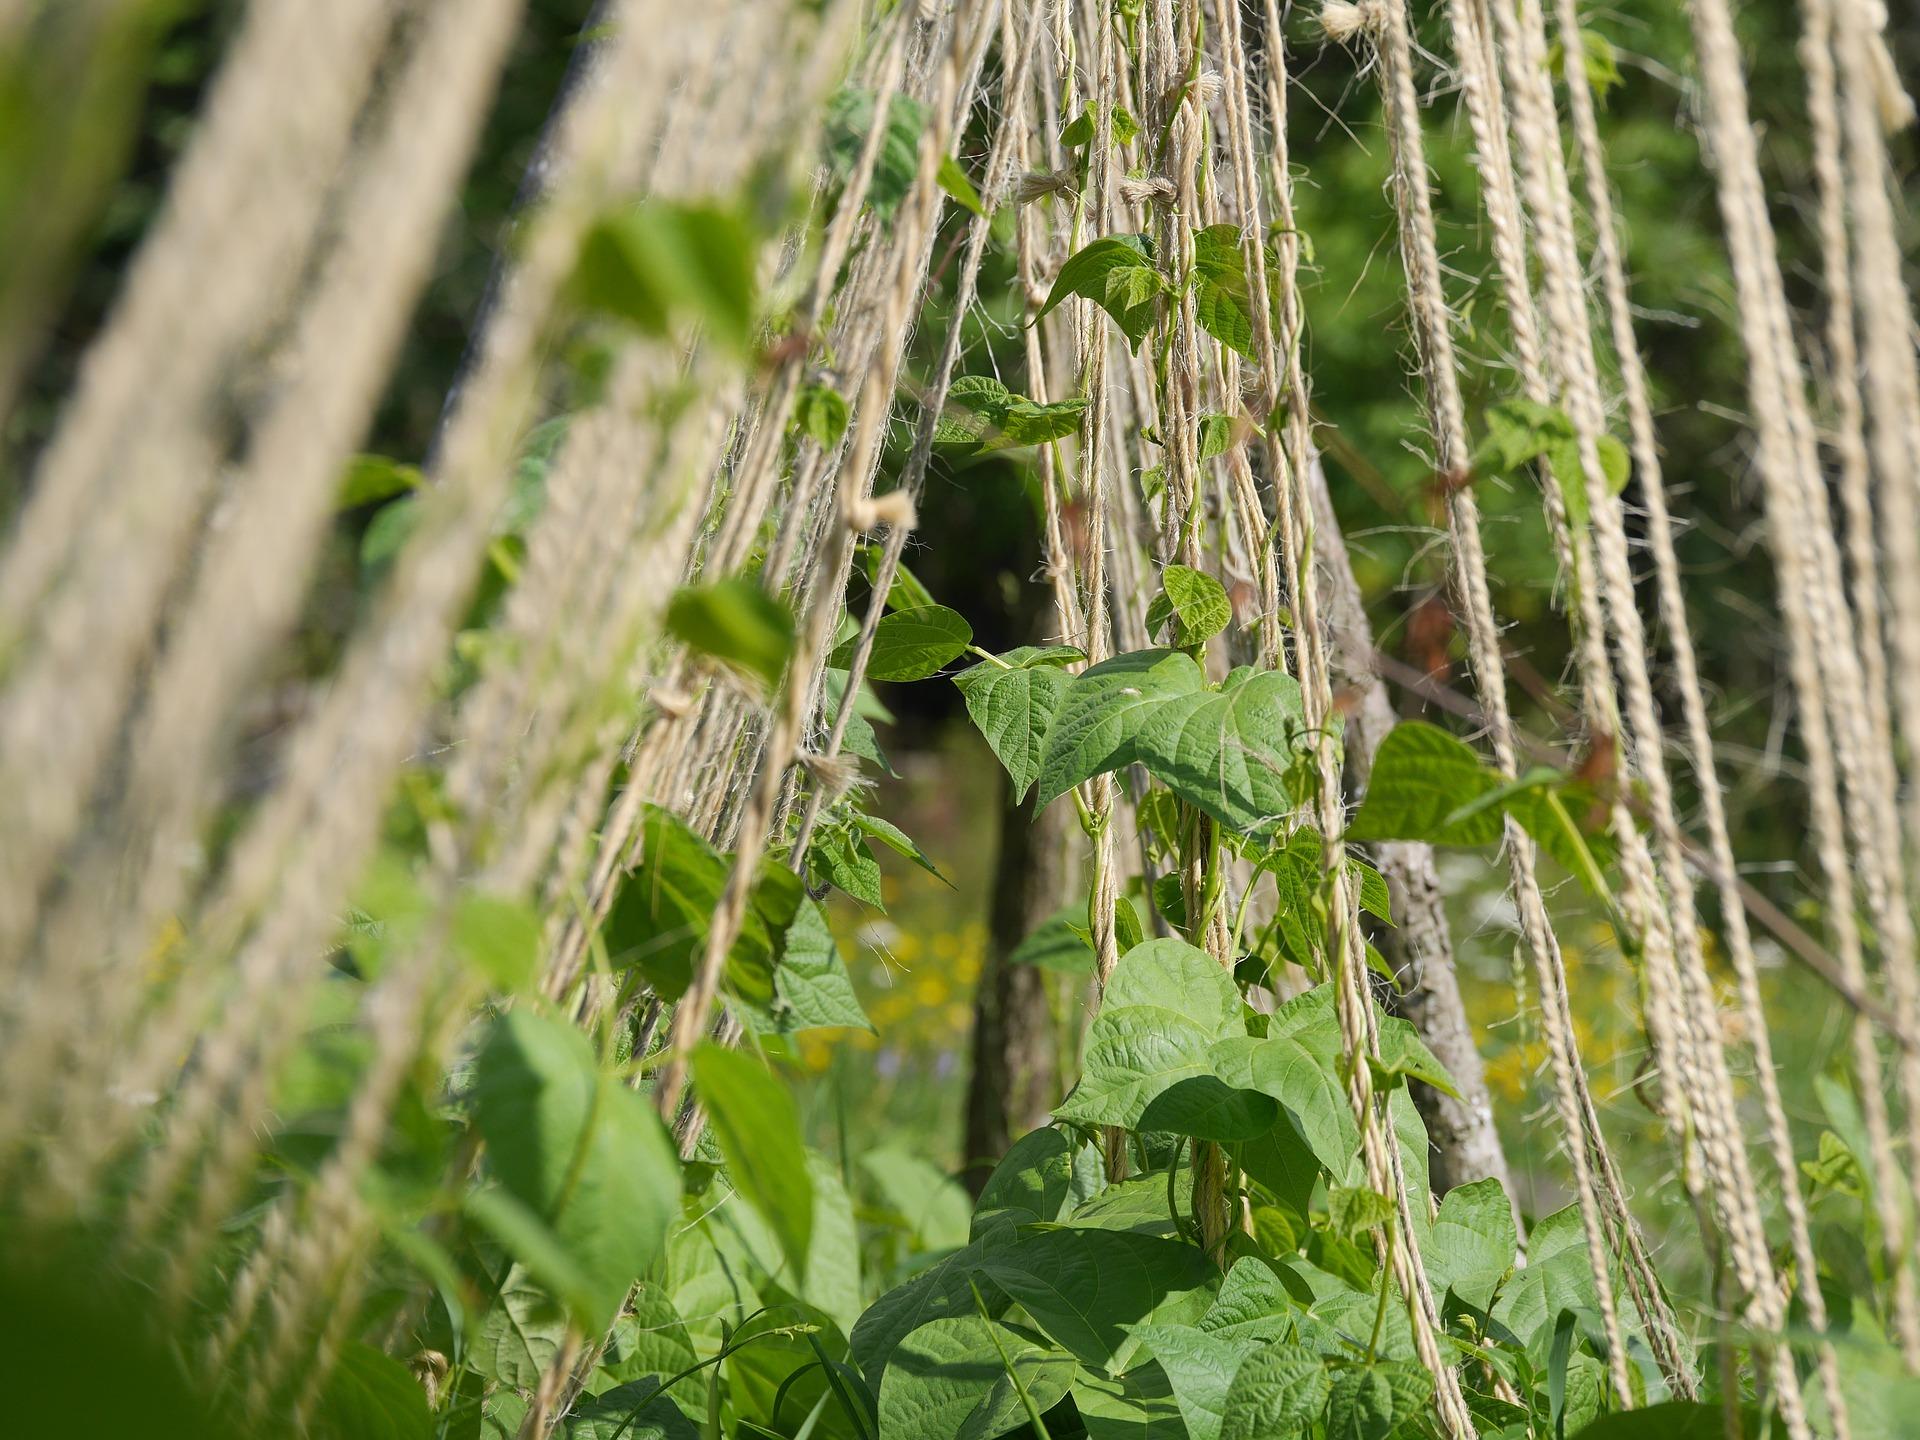 String Trellis for Pole Beans